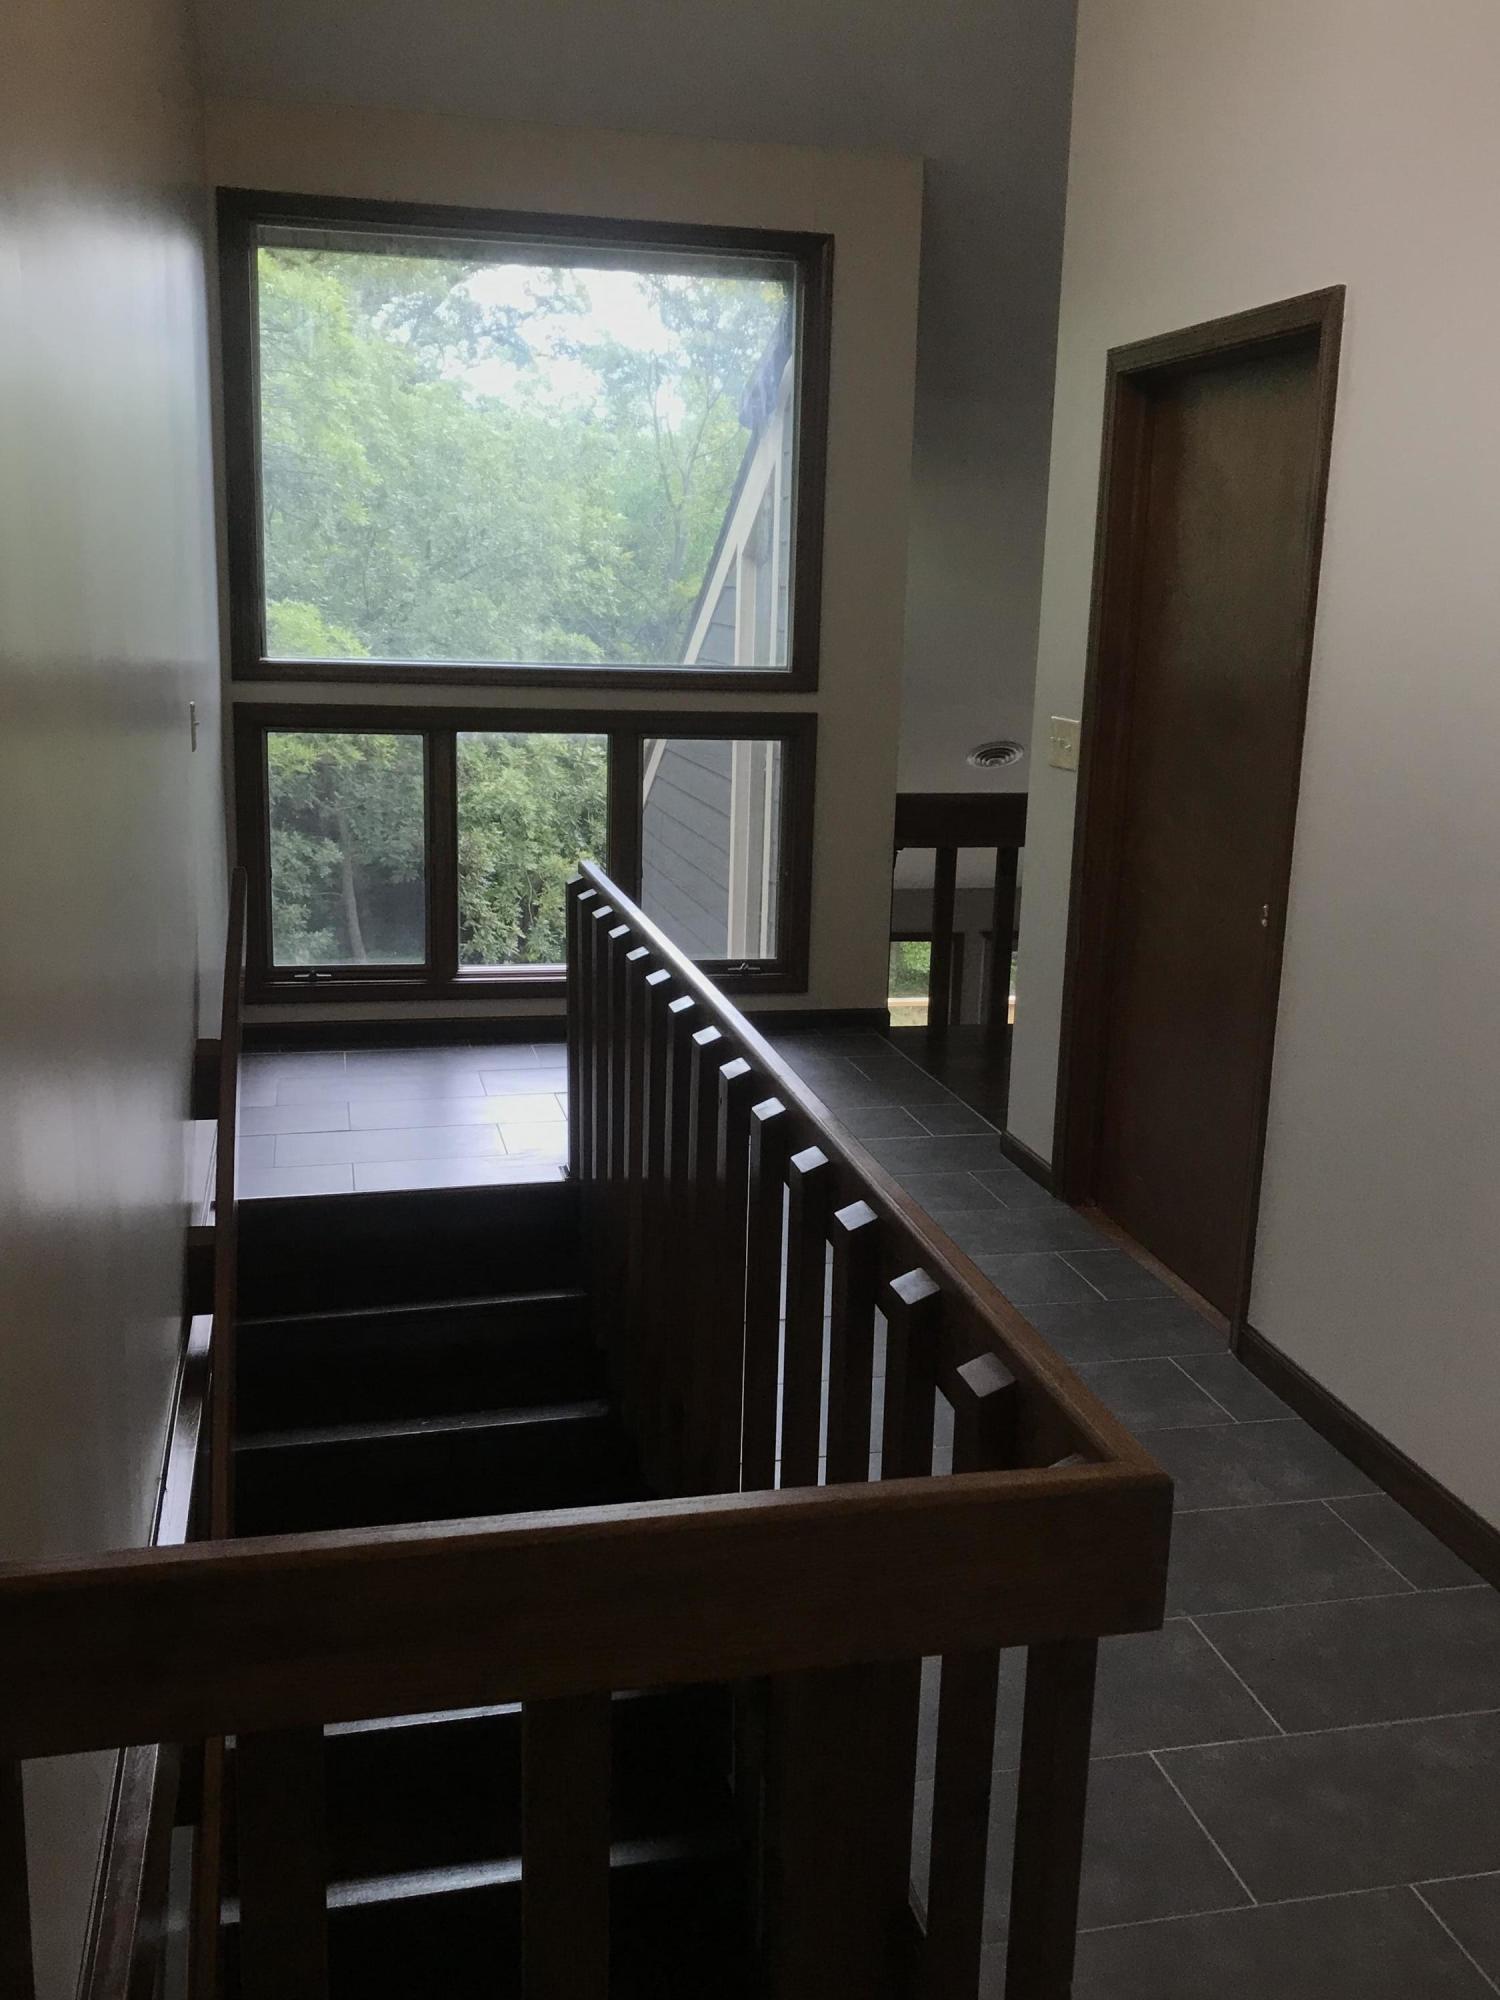 28029 EARL CHARLES Street, Maryville, Missouri 64468, 5 Bedrooms Bedrooms, ,3 BathroomsBathrooms,Residential,EARL CHARLES,4856